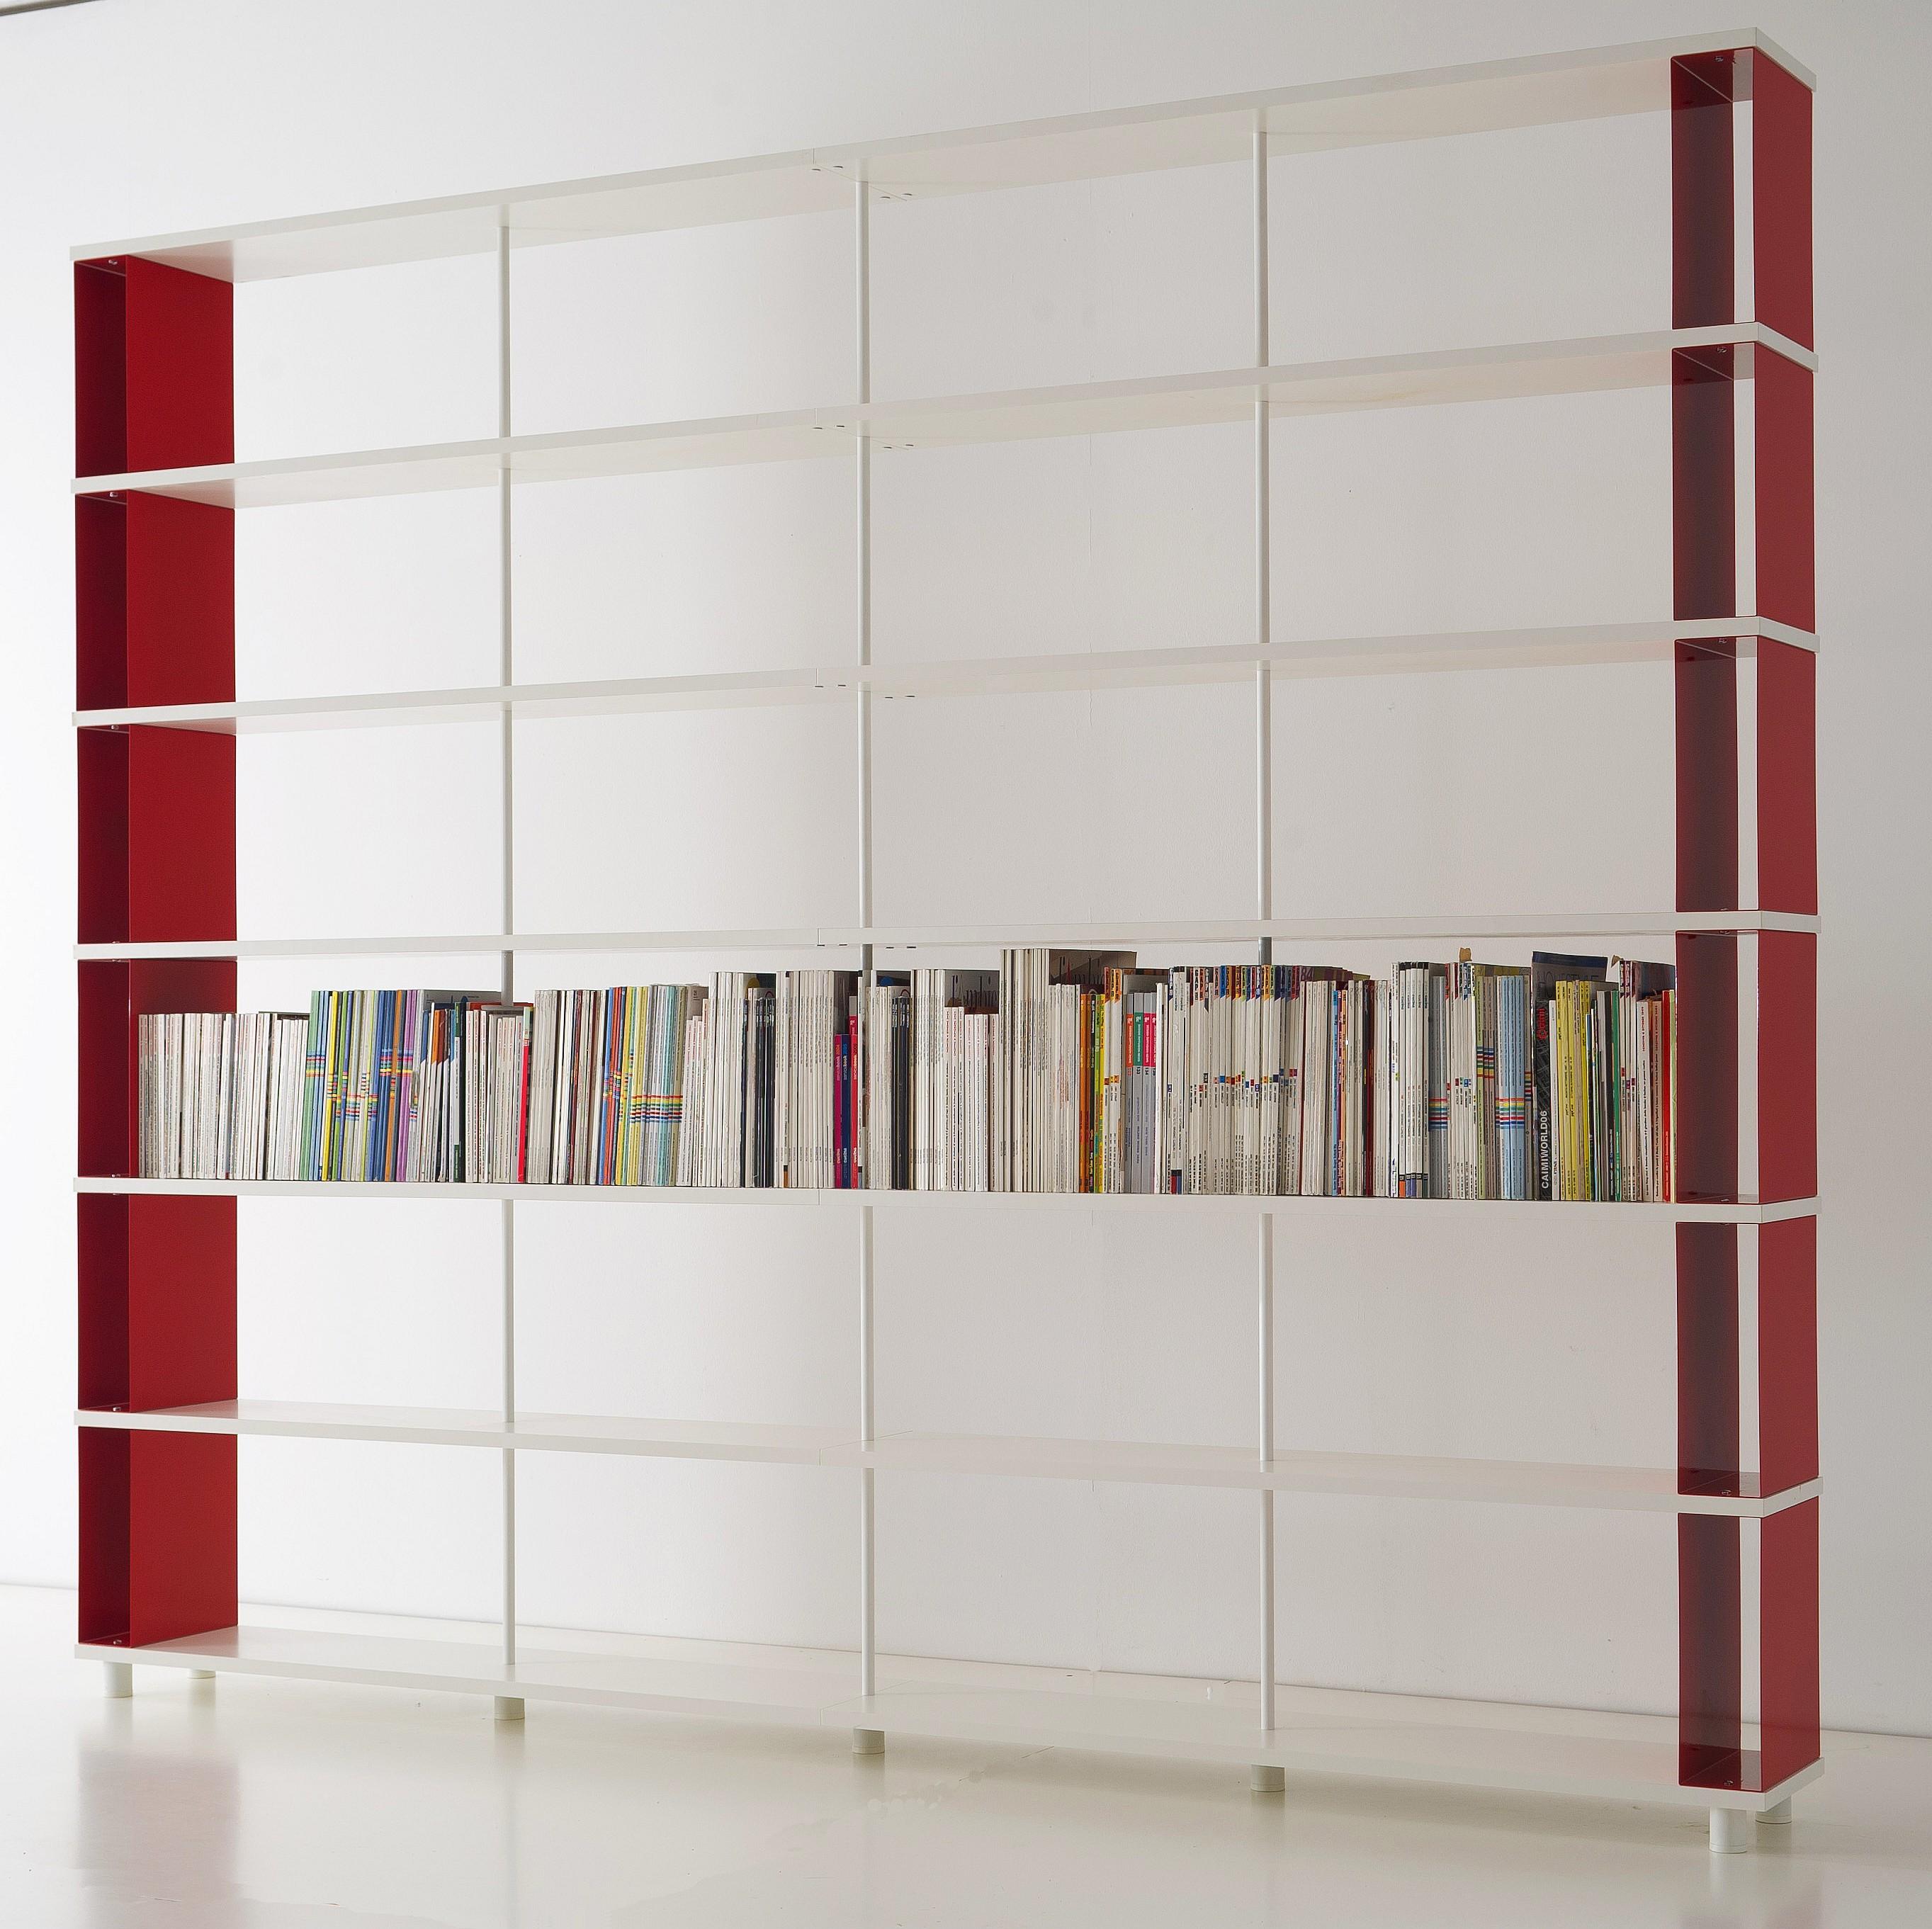 Librerie componibili skaffa red shop online for Libreria shop online